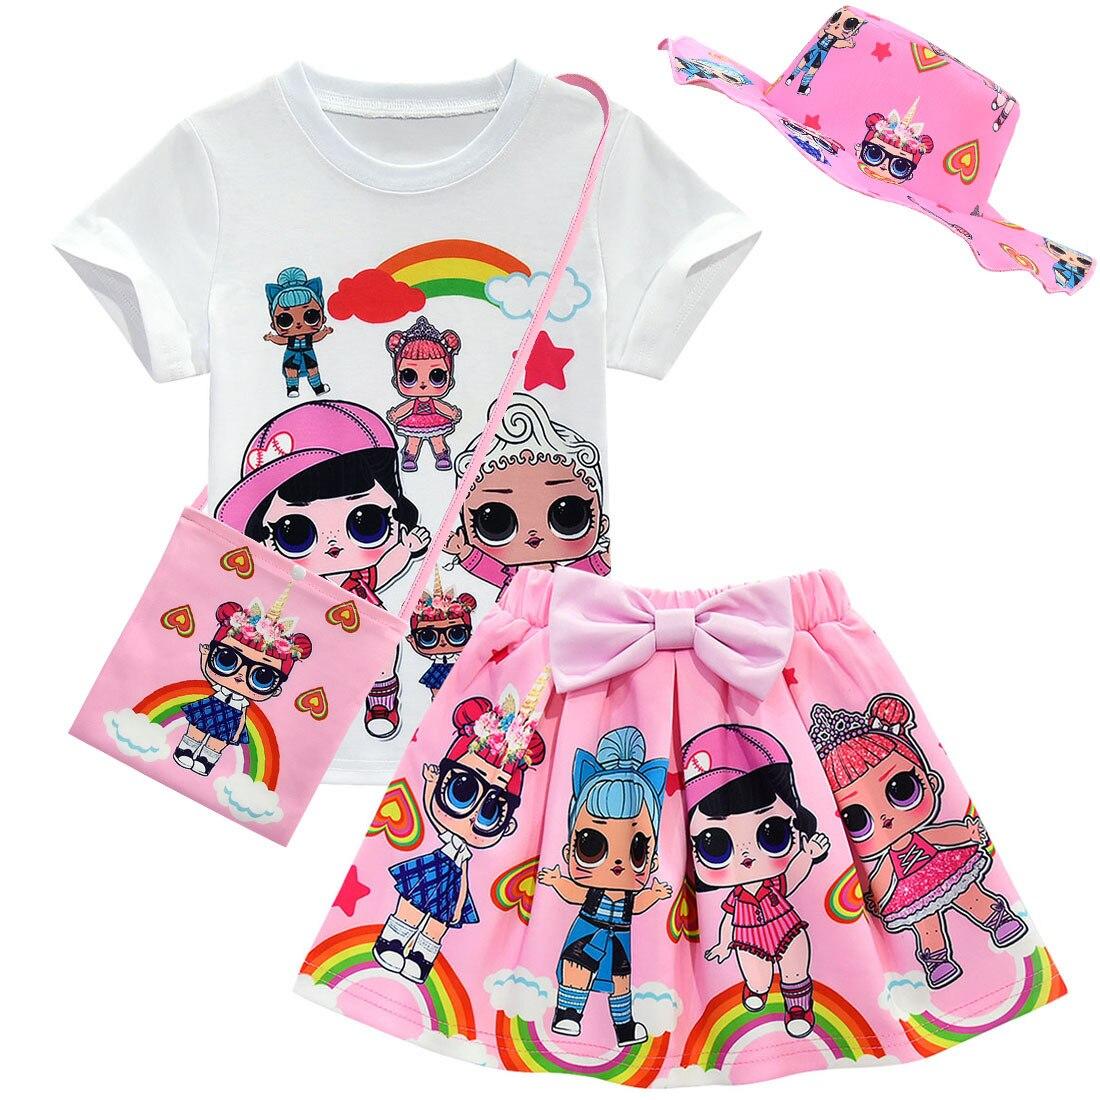 Girls Birthday Party Tutu Lol Dress Tshirt Skirt Bag Hat Gloves Suit Girls Clothing Lol Set Baby Kids Toddler Girls Set Clothes